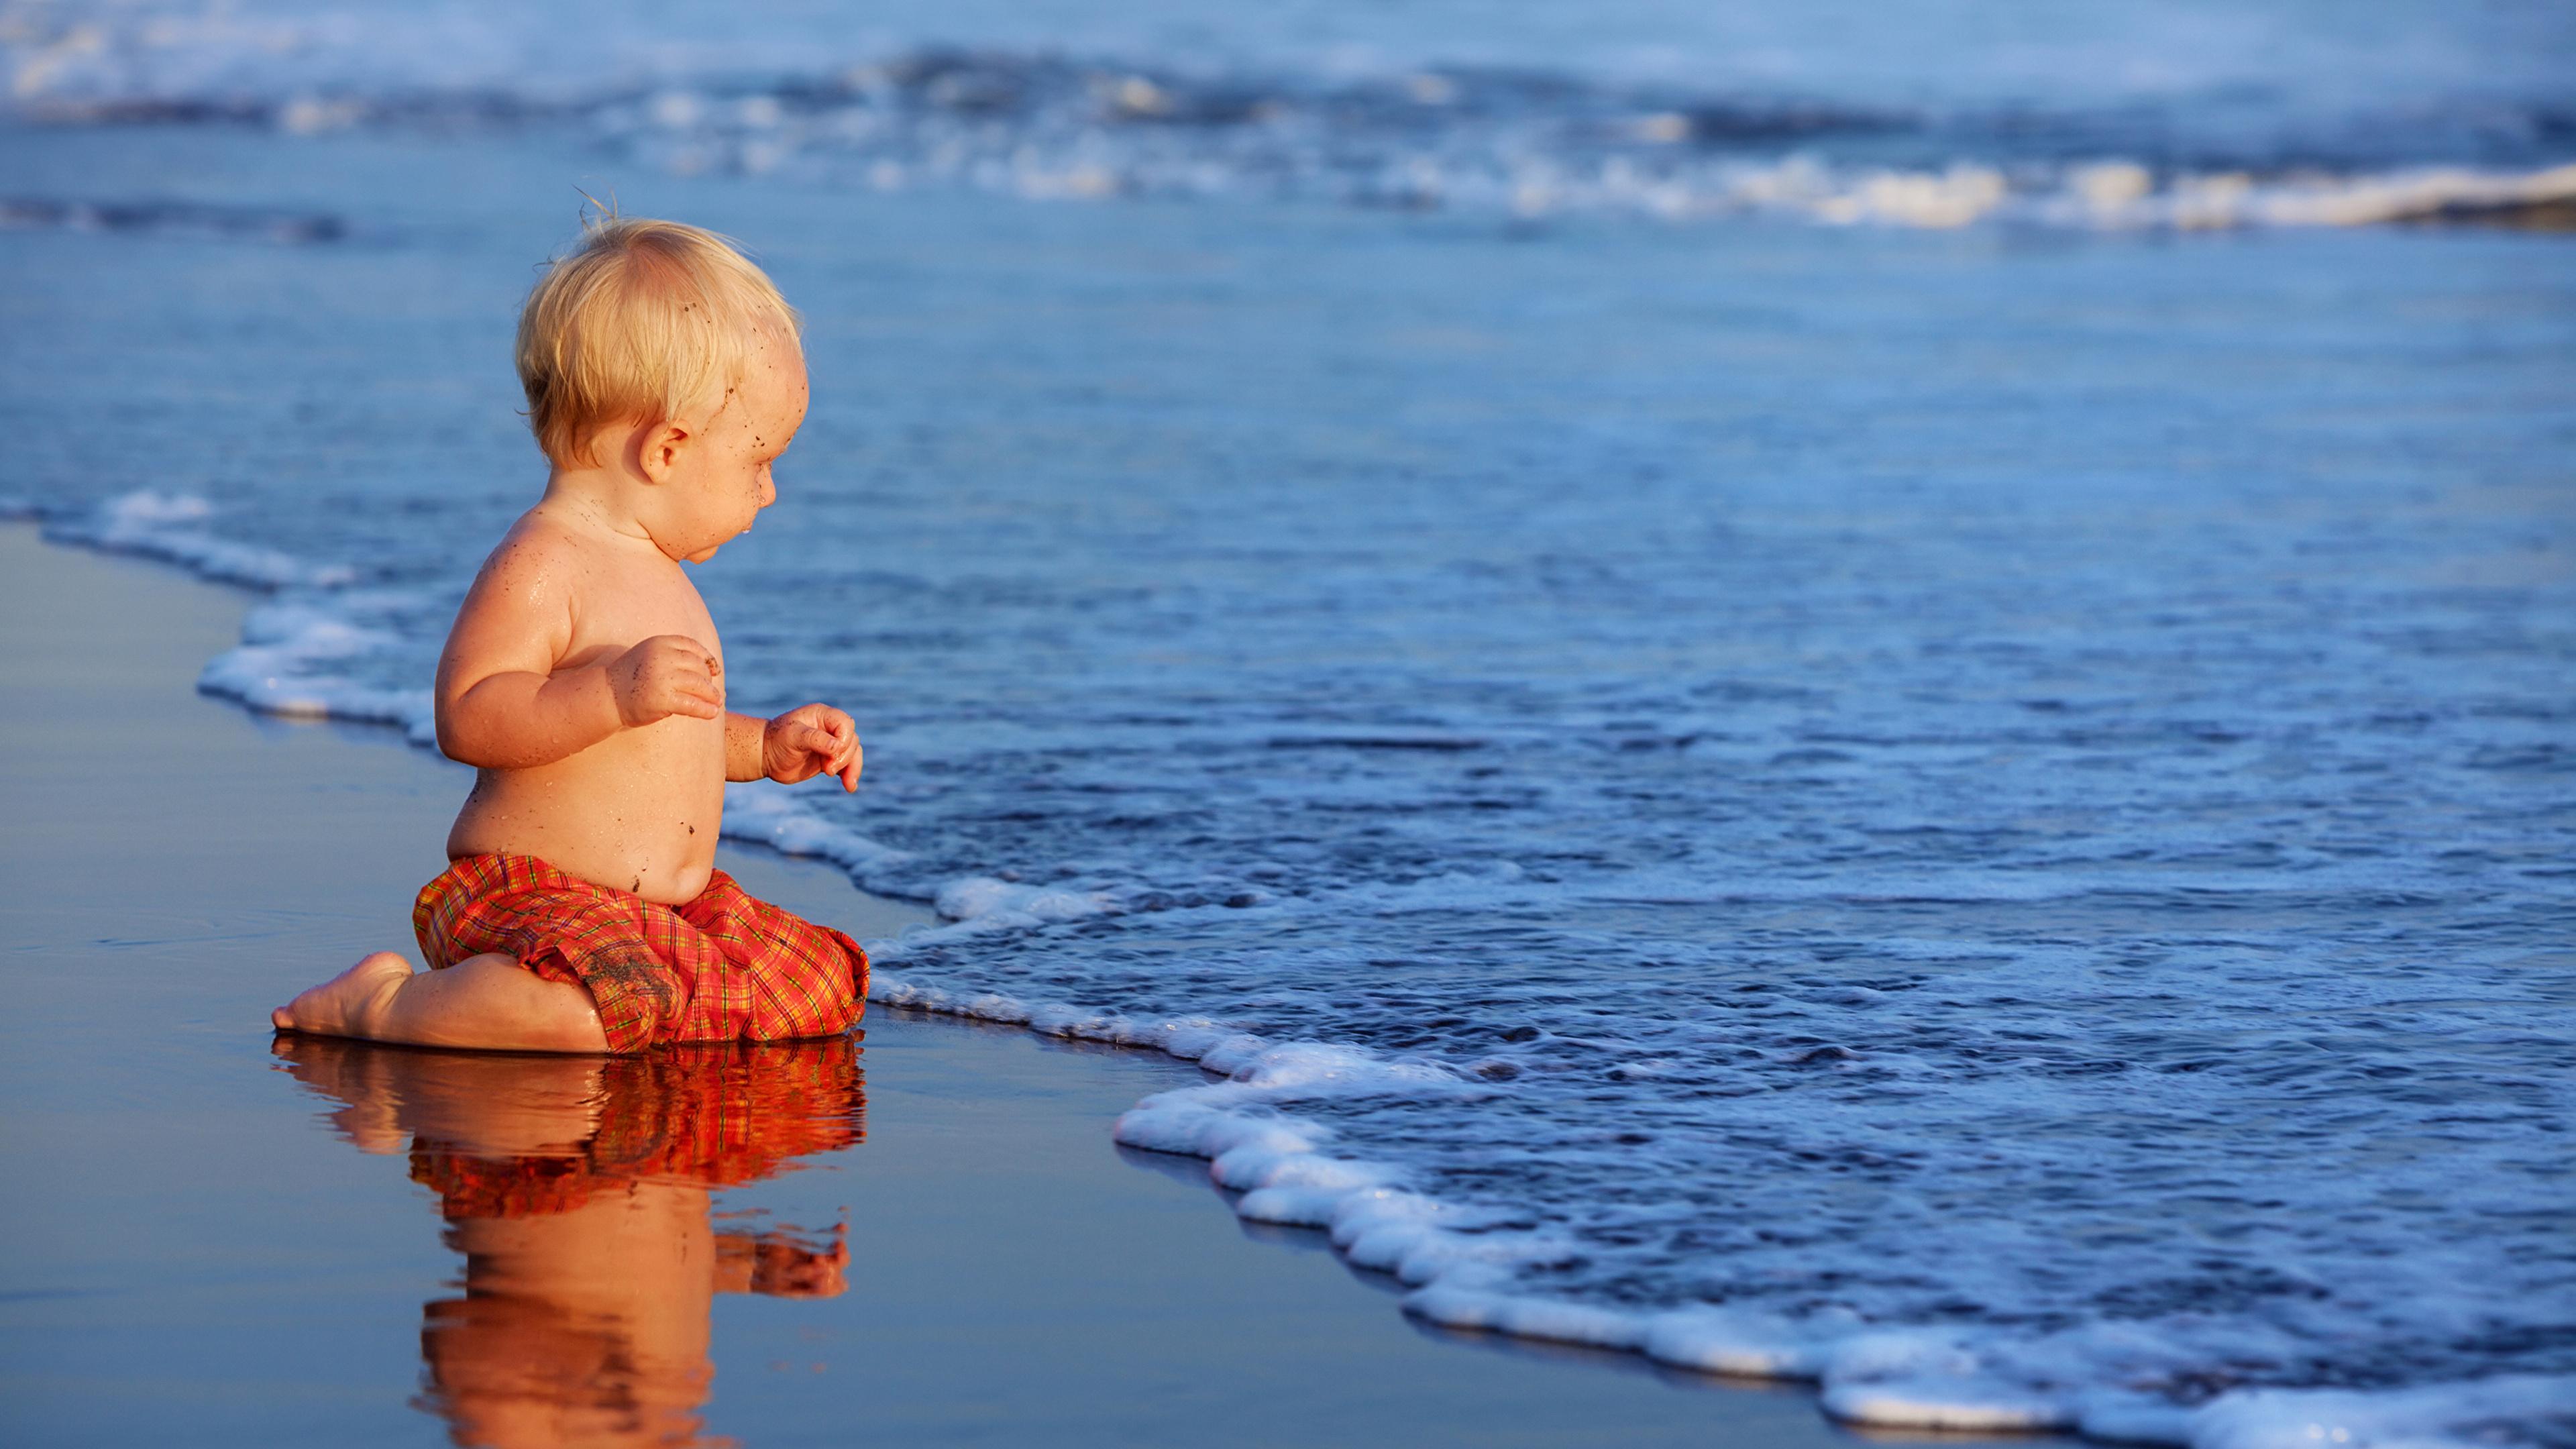 Фотография мальчик Младенцы Дети Волны берег 3840x2160 Мальчики младенца младенец мальчишки мальчишка грудной ребёнок ребёнок Побережье